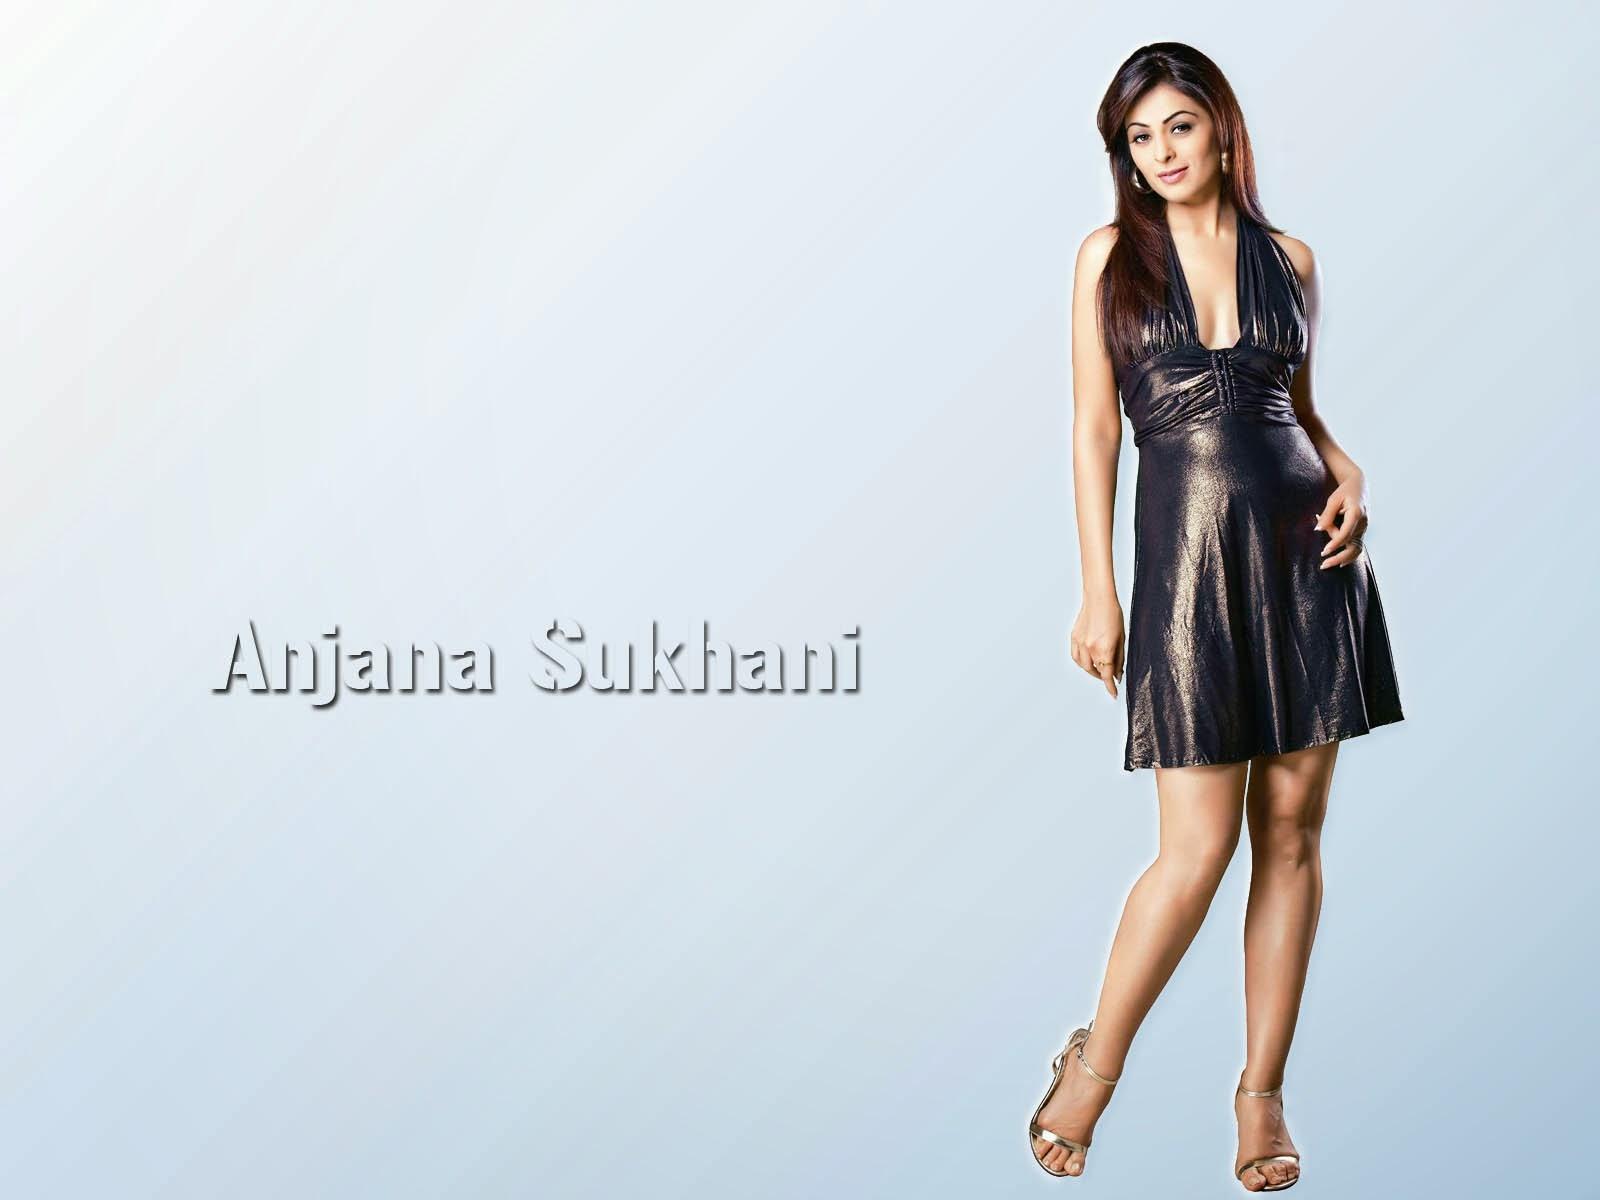 Anjana Sukhani hot pics